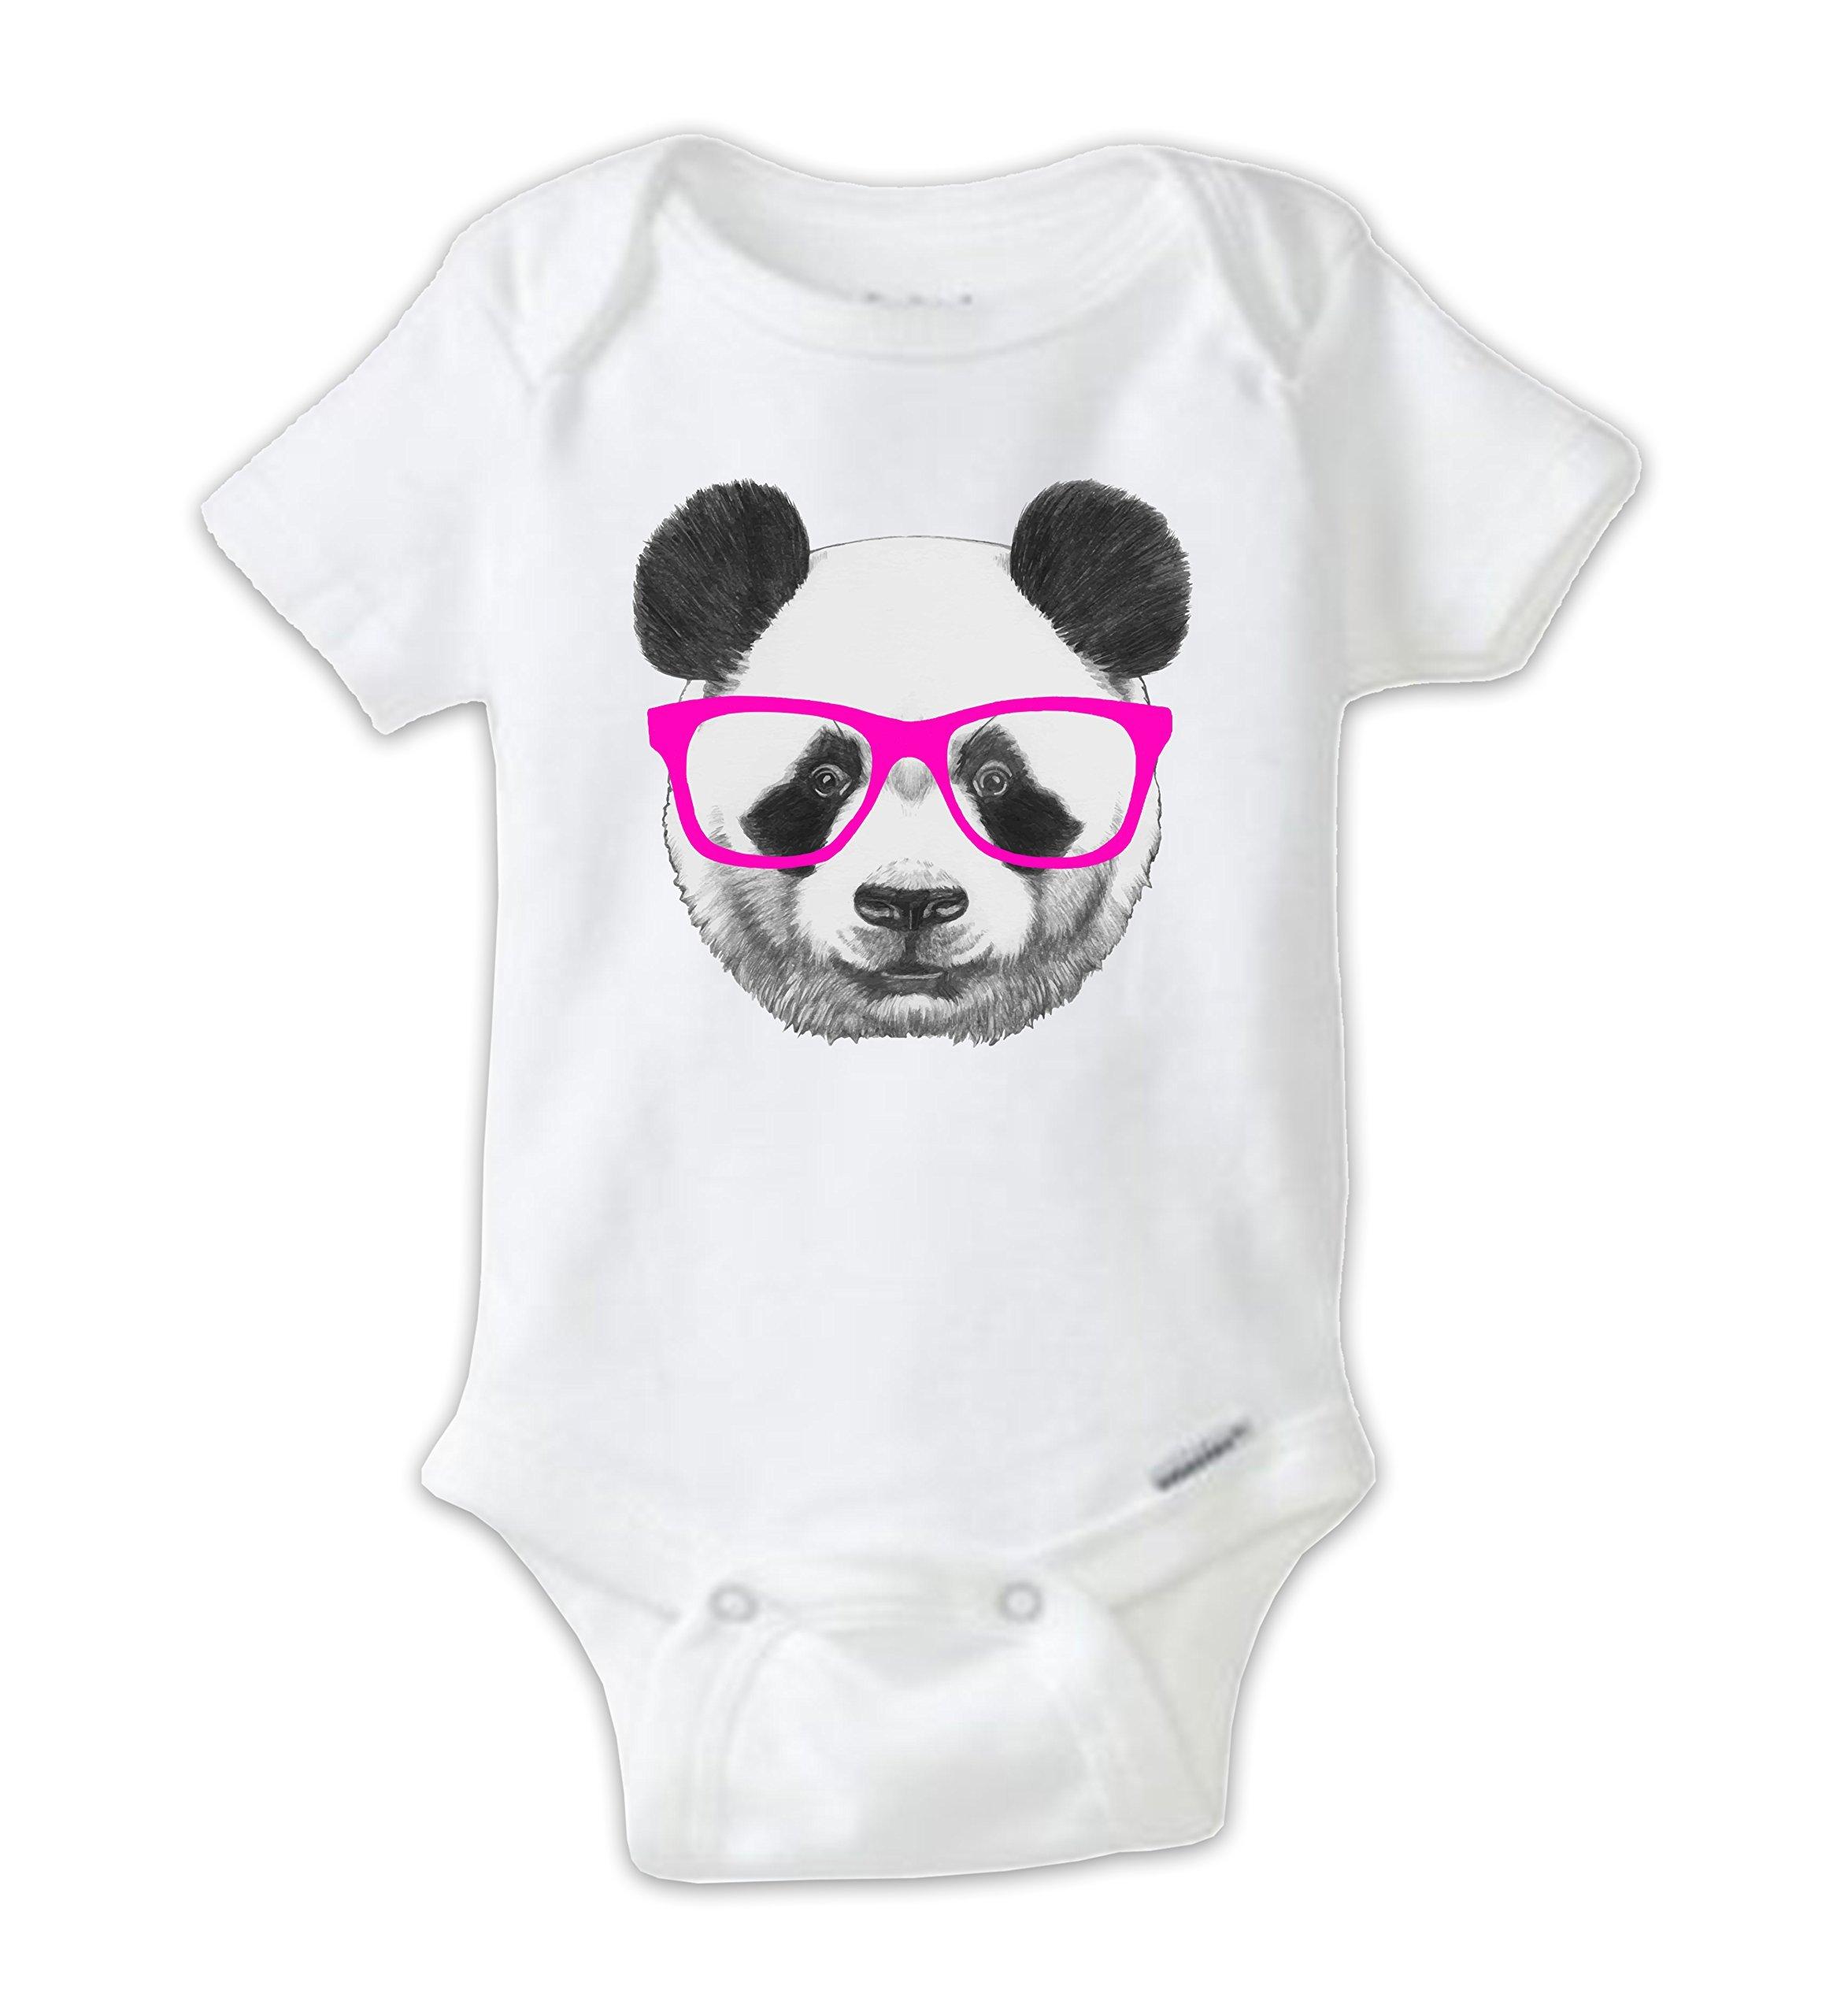 Hipster Panda Onesie, Panda Baby Bodysuit Pink Glasses (Newborn)